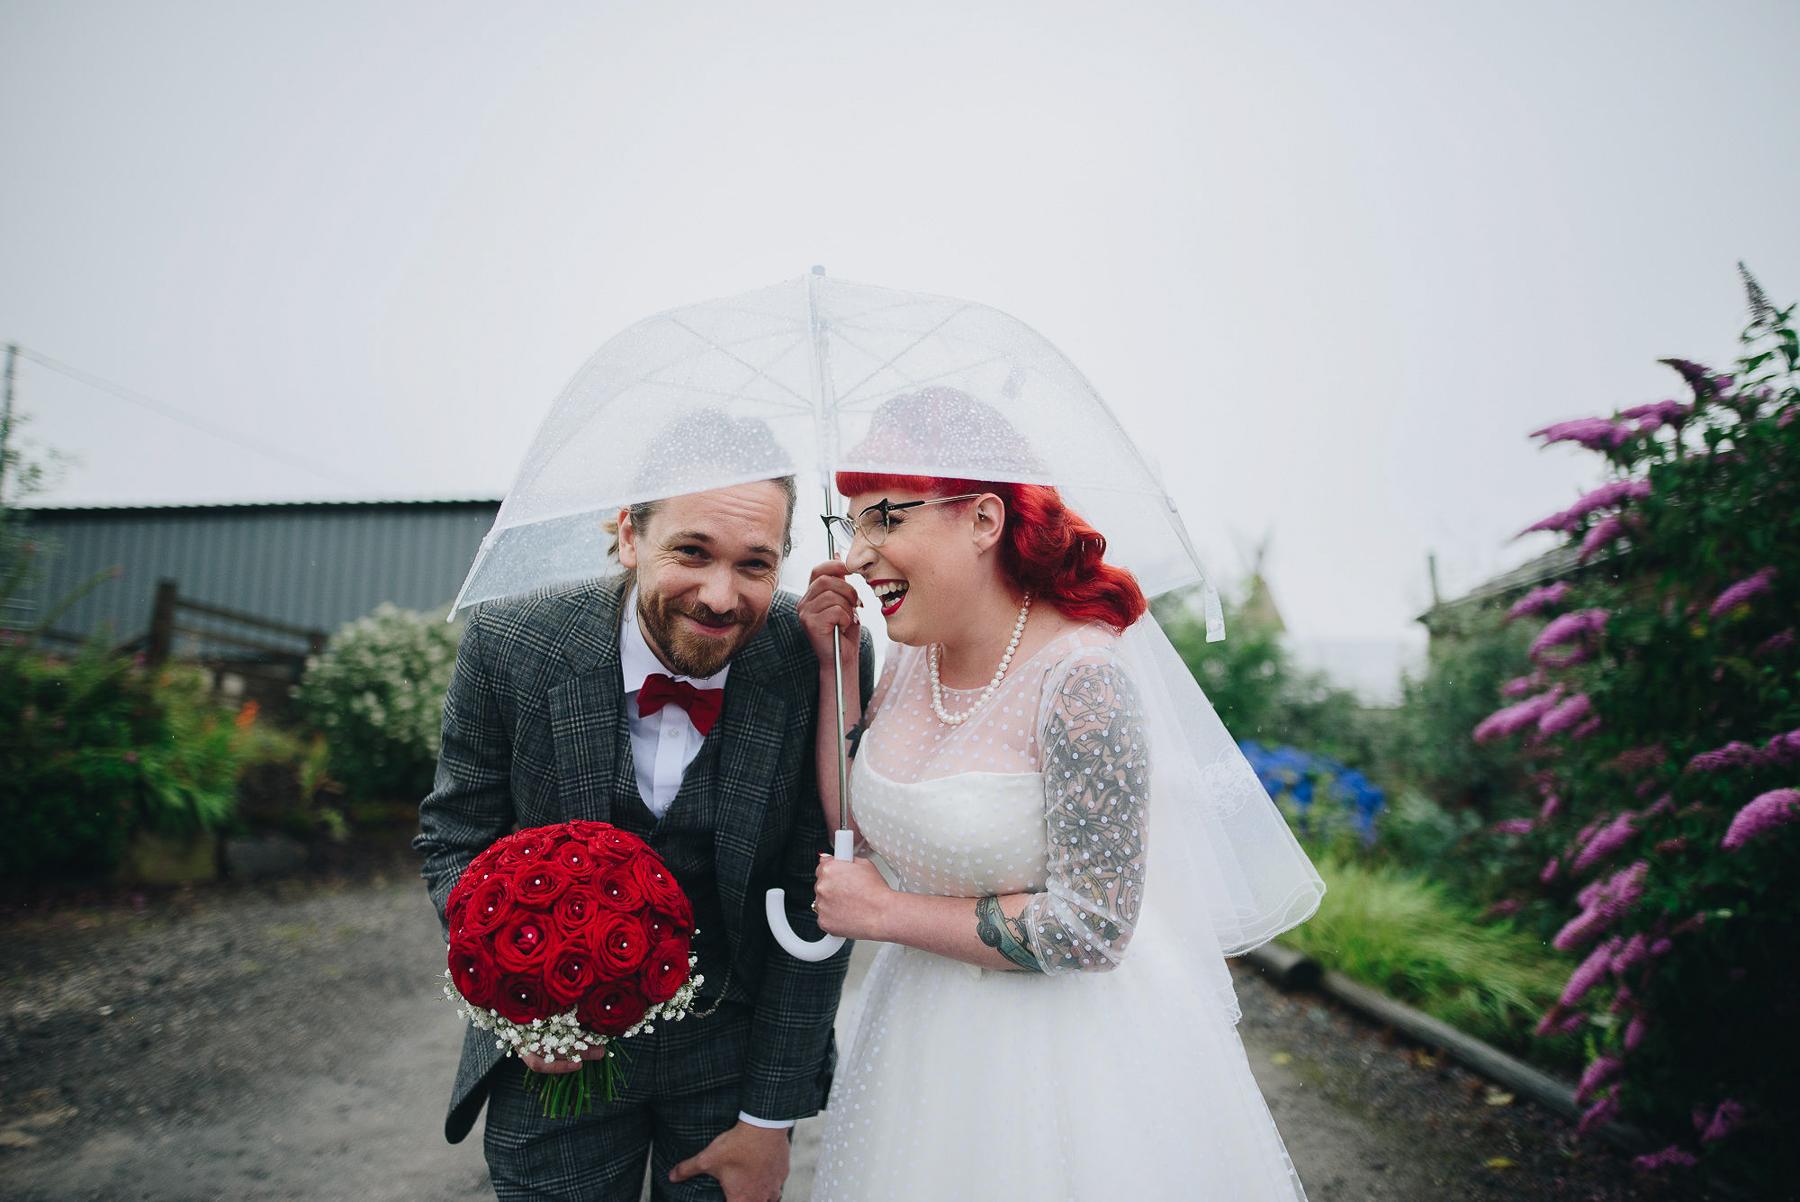 Wellbeing_Farm_Wedding_Photography_The_Pin-Up_Bride_Lara_Shaun-94.jpg